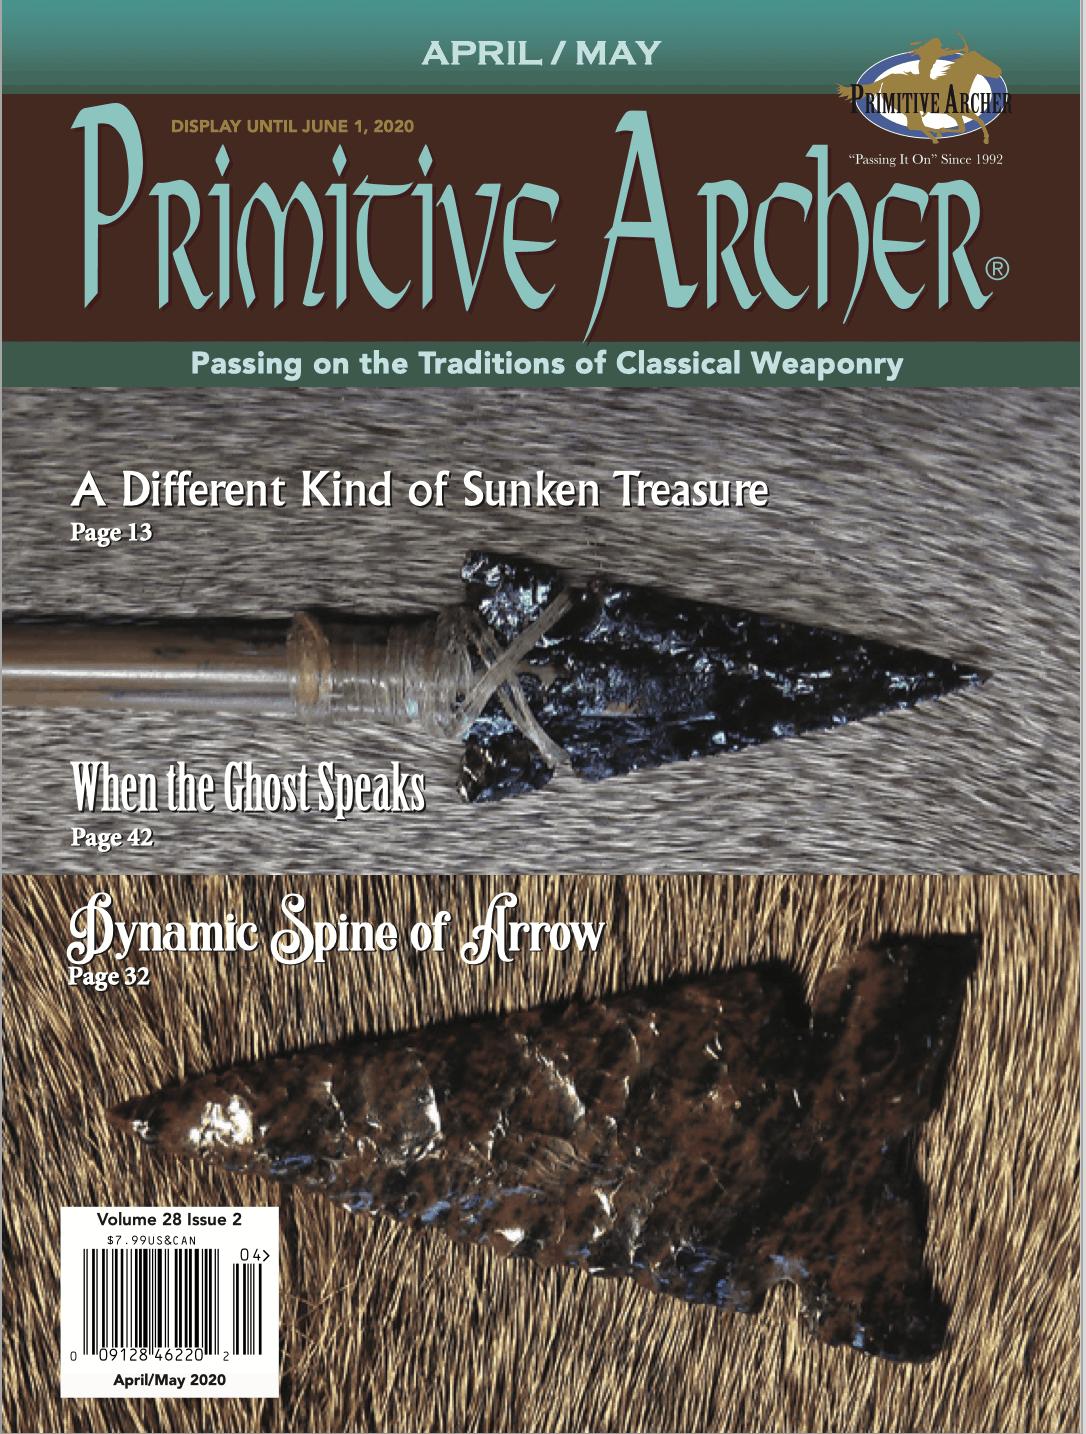 Primitive Archer Magazine Volume 28 Issue 2